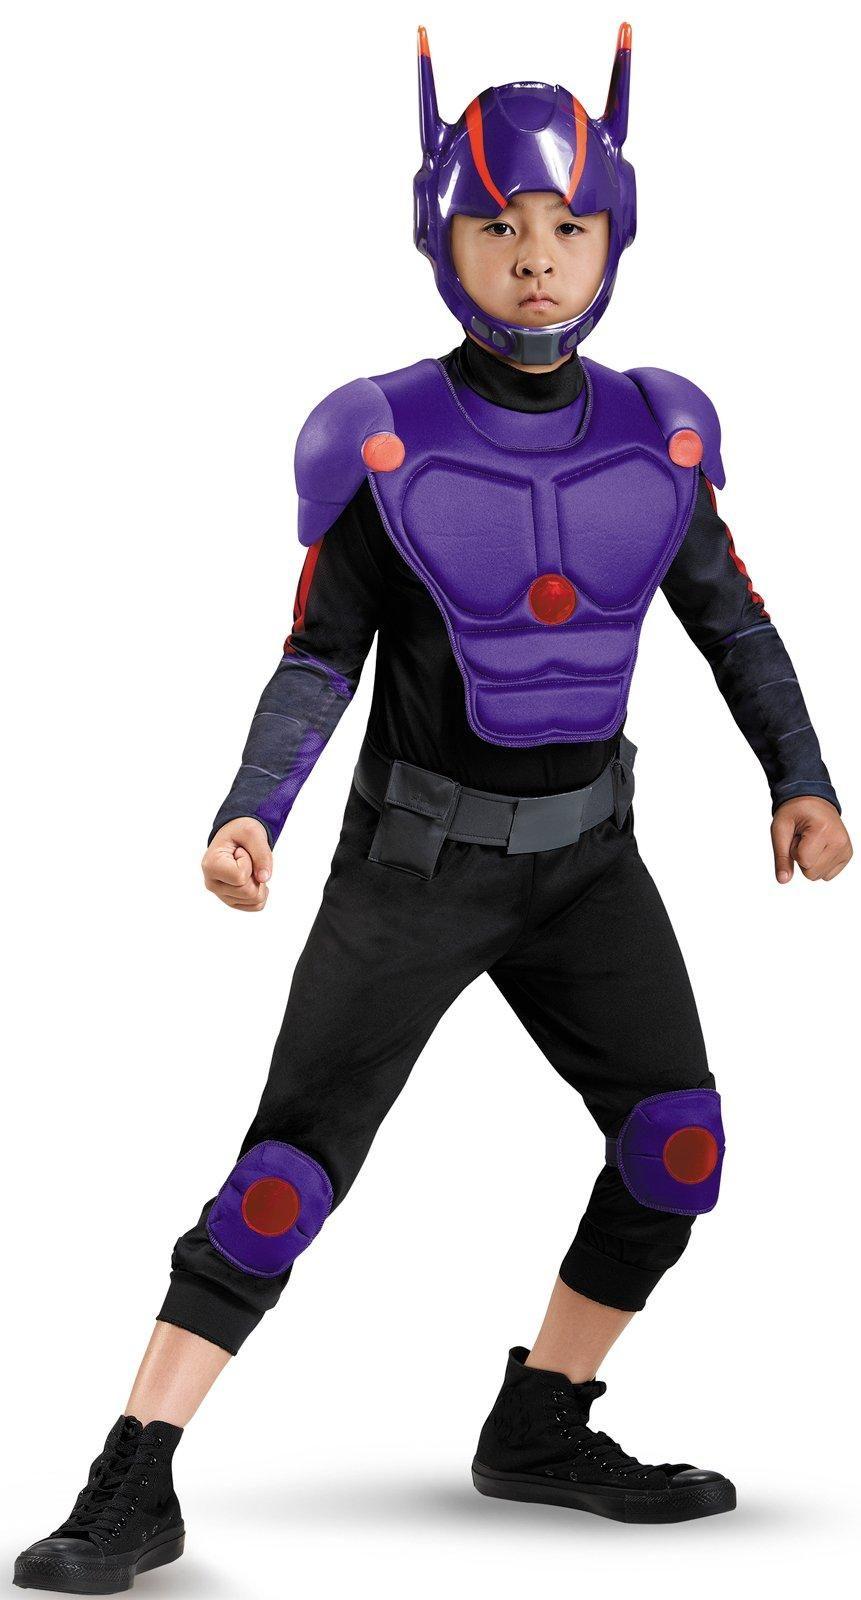 Big Hero 6: Hiro Deluxe Costume For Toddlers | Actividades y Fiestas